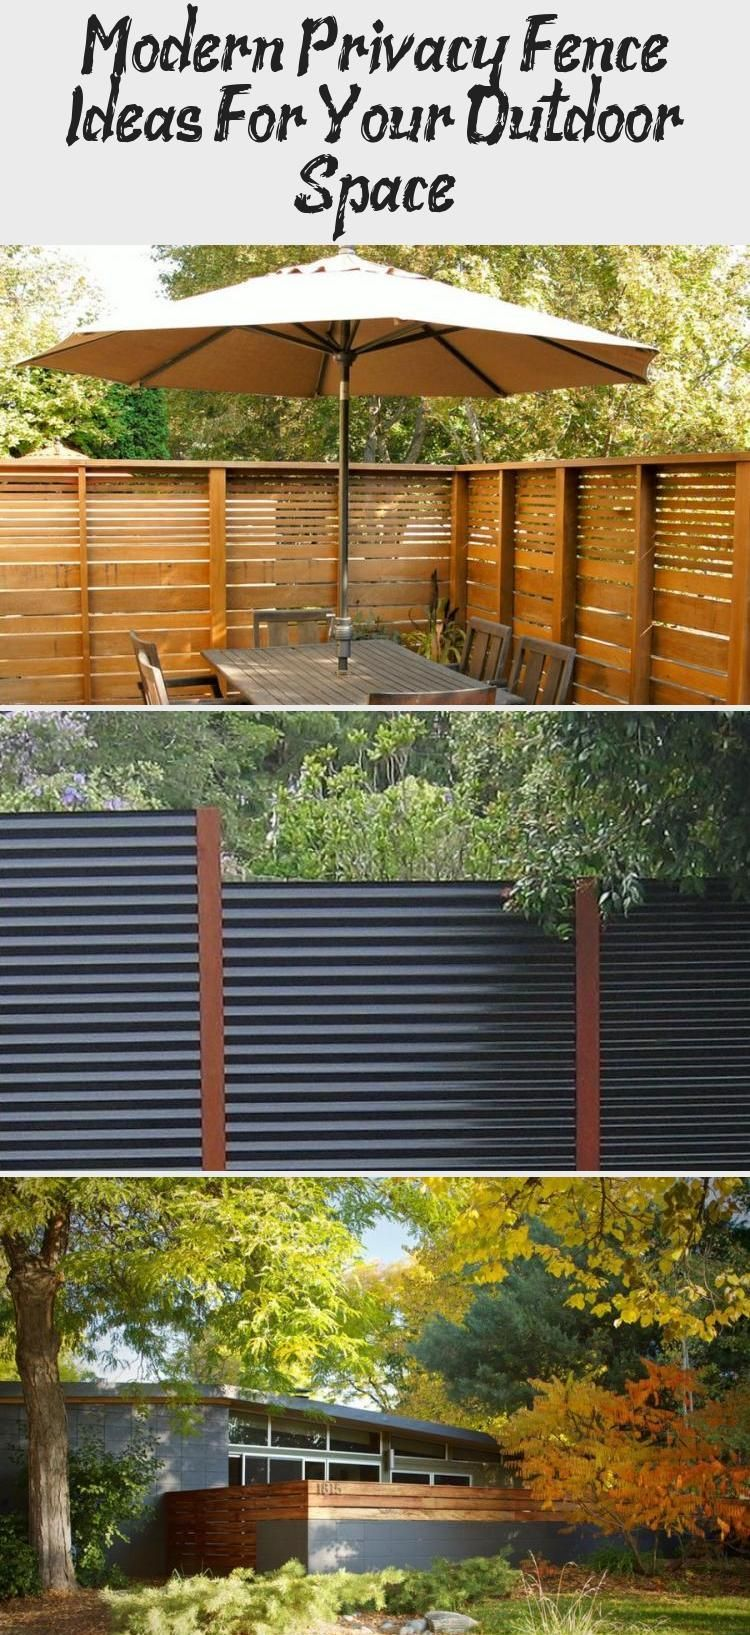 Corrugated Metal Privacy Fence Zaunrost Zaunschwarz Gabionenzaun Zaunsichtsc Corrugated Fen In 2020 Privacy Fence Designs Natural Privacy Fences Privacy Plants